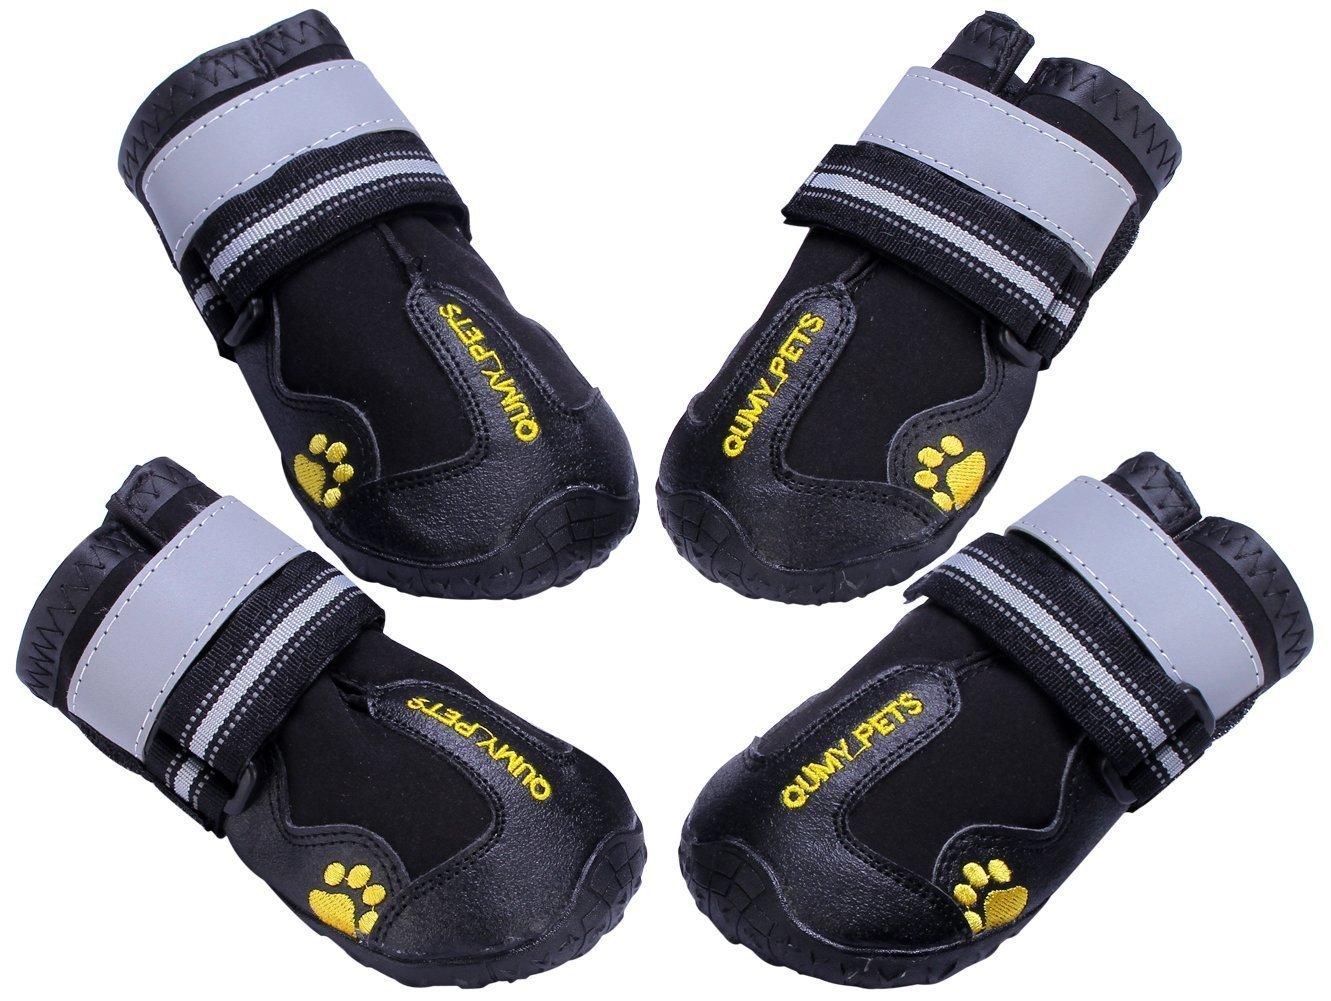 2. QUMY Dog Boots